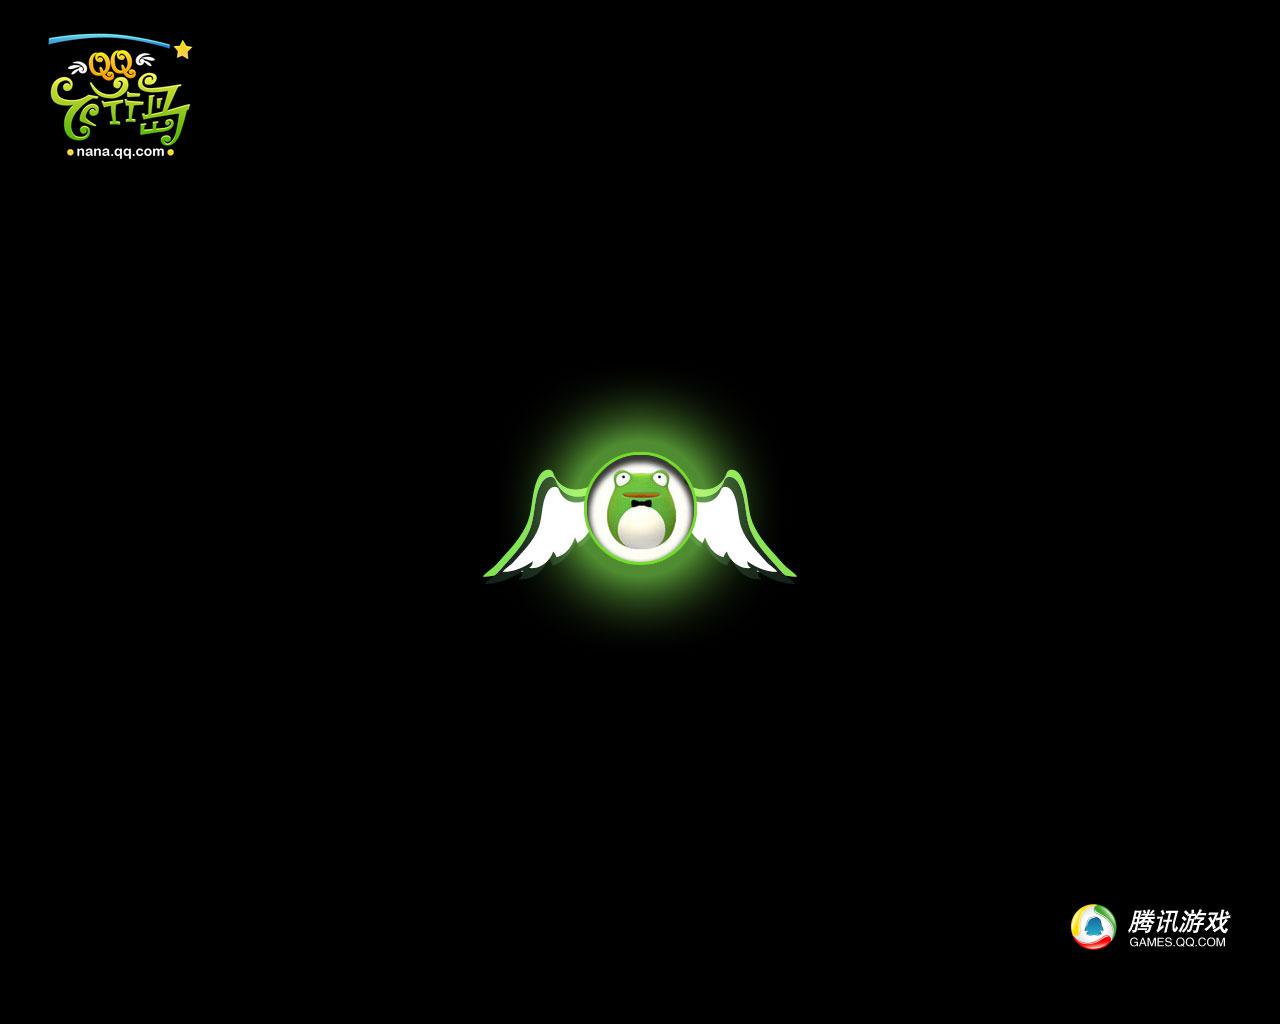 QQ飞行岛是全球首款飞行射击休闲网络游戏,它以在荒岛Nanaimo发生的冒险和挑战为背景,采用飞行射击的战斗方式,同时融入卡片收集系统、道具合成系统、宠物成长系统、房屋系统等RPG要素,为玩家打造了一个全新概念的休闲网游!   在这里,所有爱好飞行射击的飞行家们集聚在神秘之岛Nanaimo,他们爱好飞行冒险,他们用智慧和技术挑战对手,用团队协作的力量攻打boss,他们欢聚在QQ飞行岛,尽情享受飞行冒险的快感!   Nanaimo是飞行岛在远古时代的称呼,在印第安语中是欢聚在一起的意思。    Let